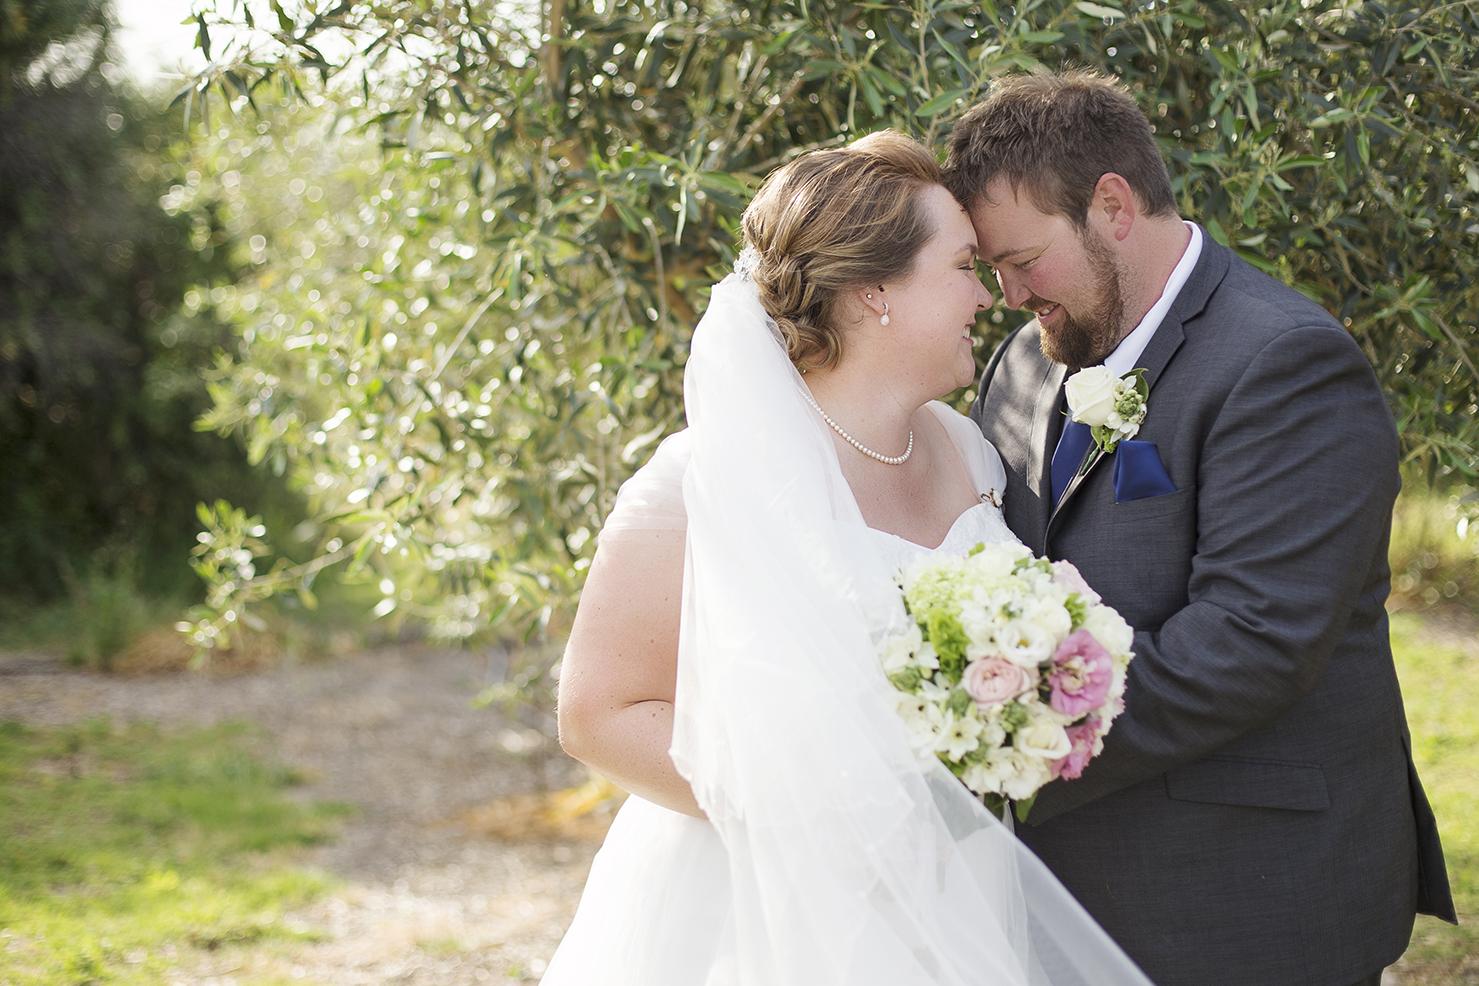 Chateau Tanuna Olive Grove Wedding Portrait 01.jpg